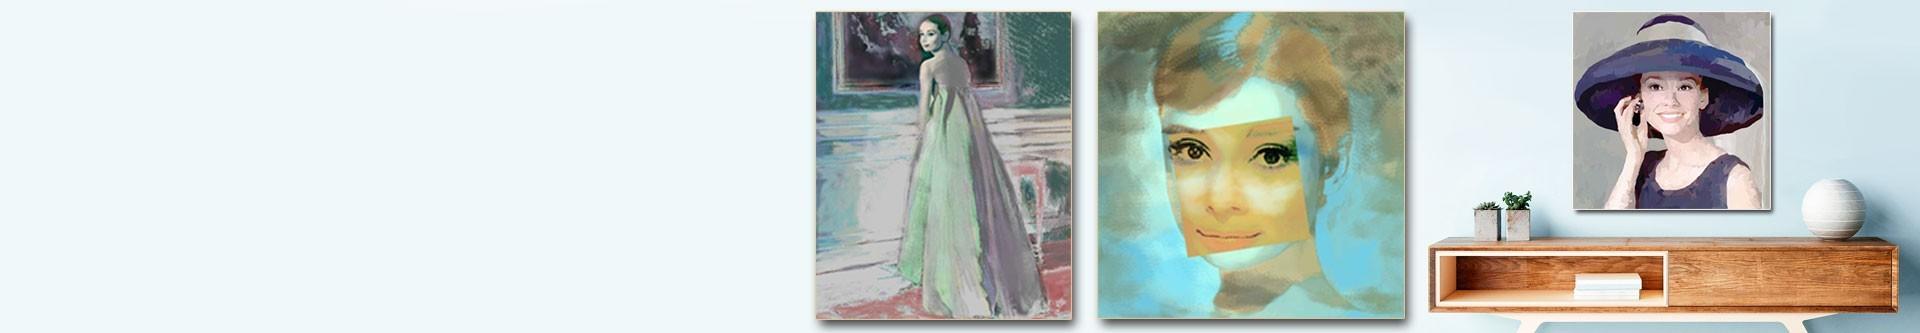 Obrazy Audrey Hepburn i plakaty w GRAFIKIOBRAZY.PL